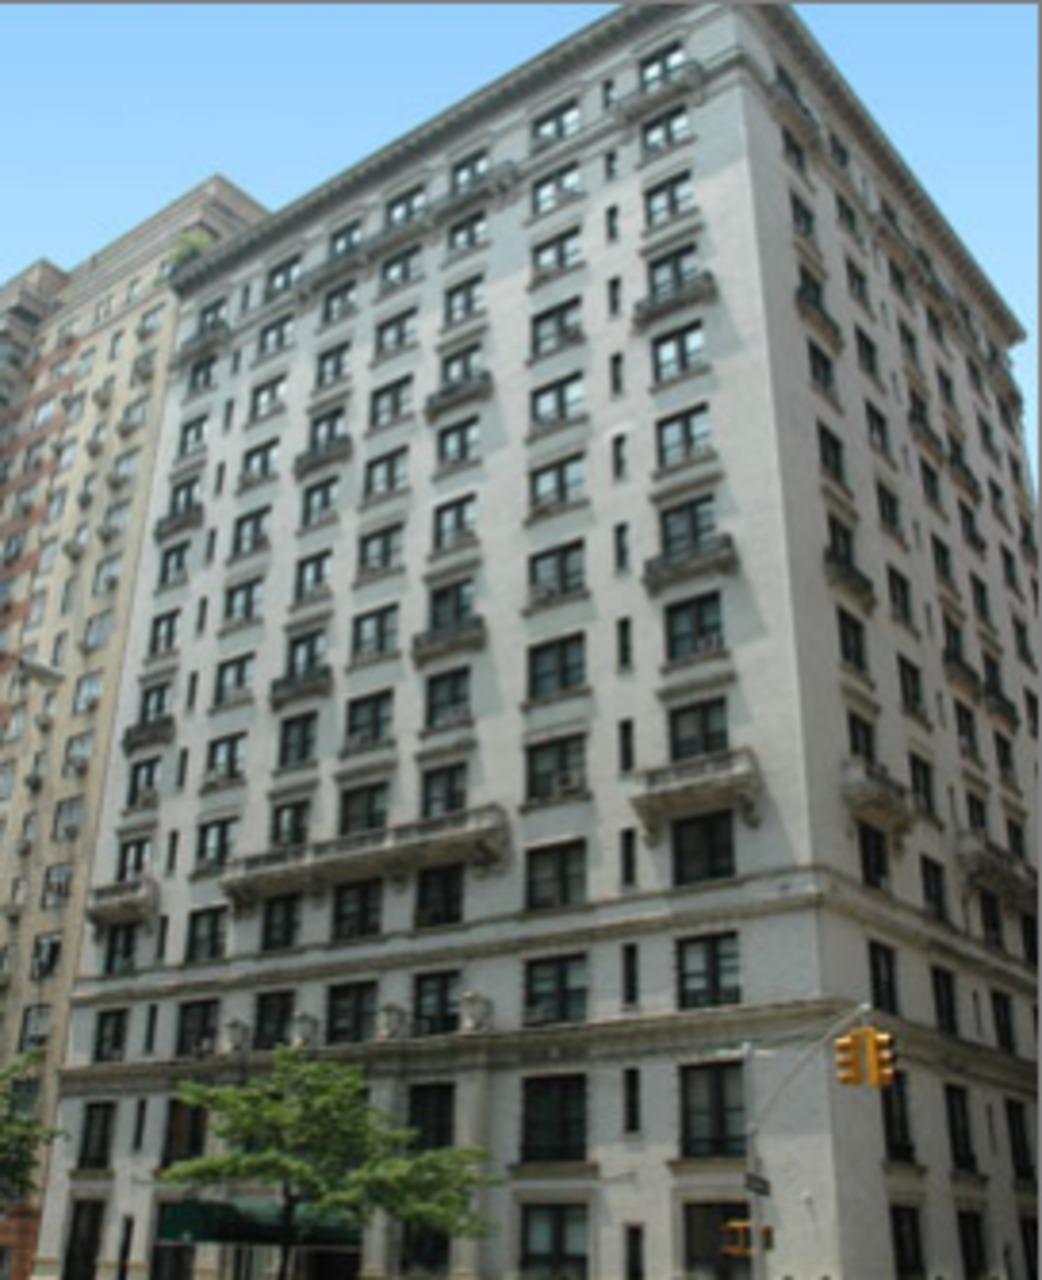 Rental Sites Nyc: 575 West End Avenue Rentals